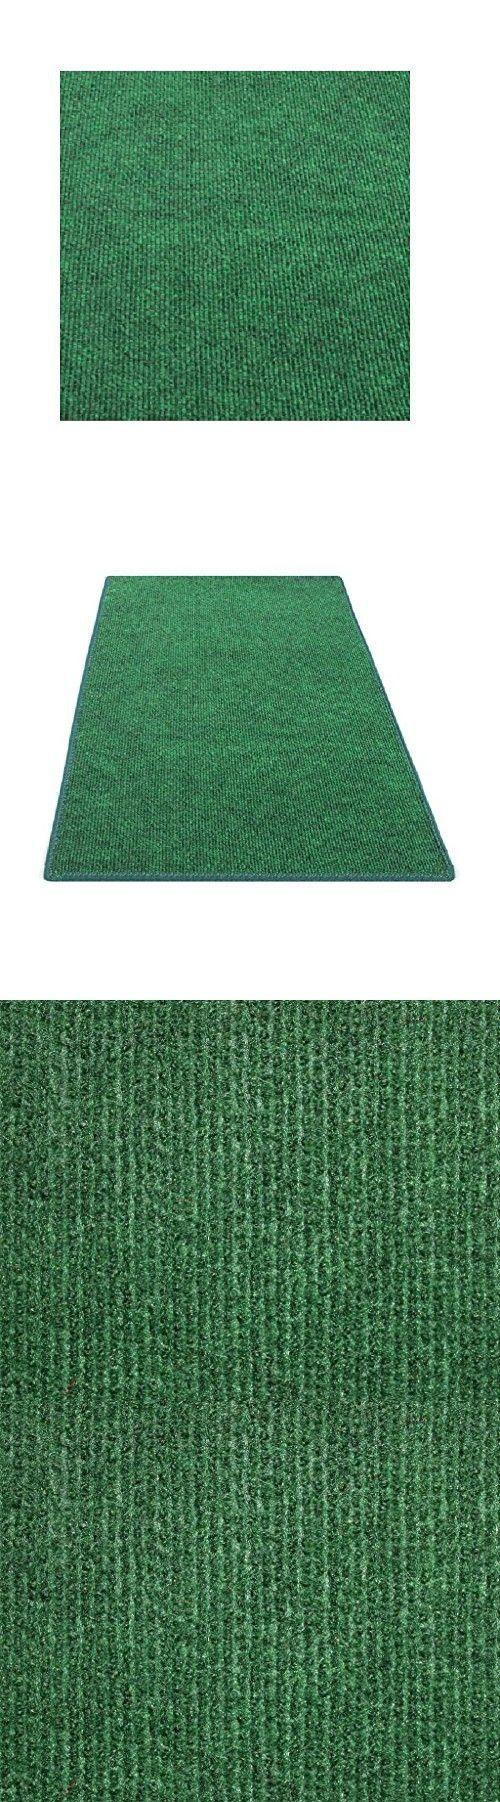 10 x10 square bright irish green